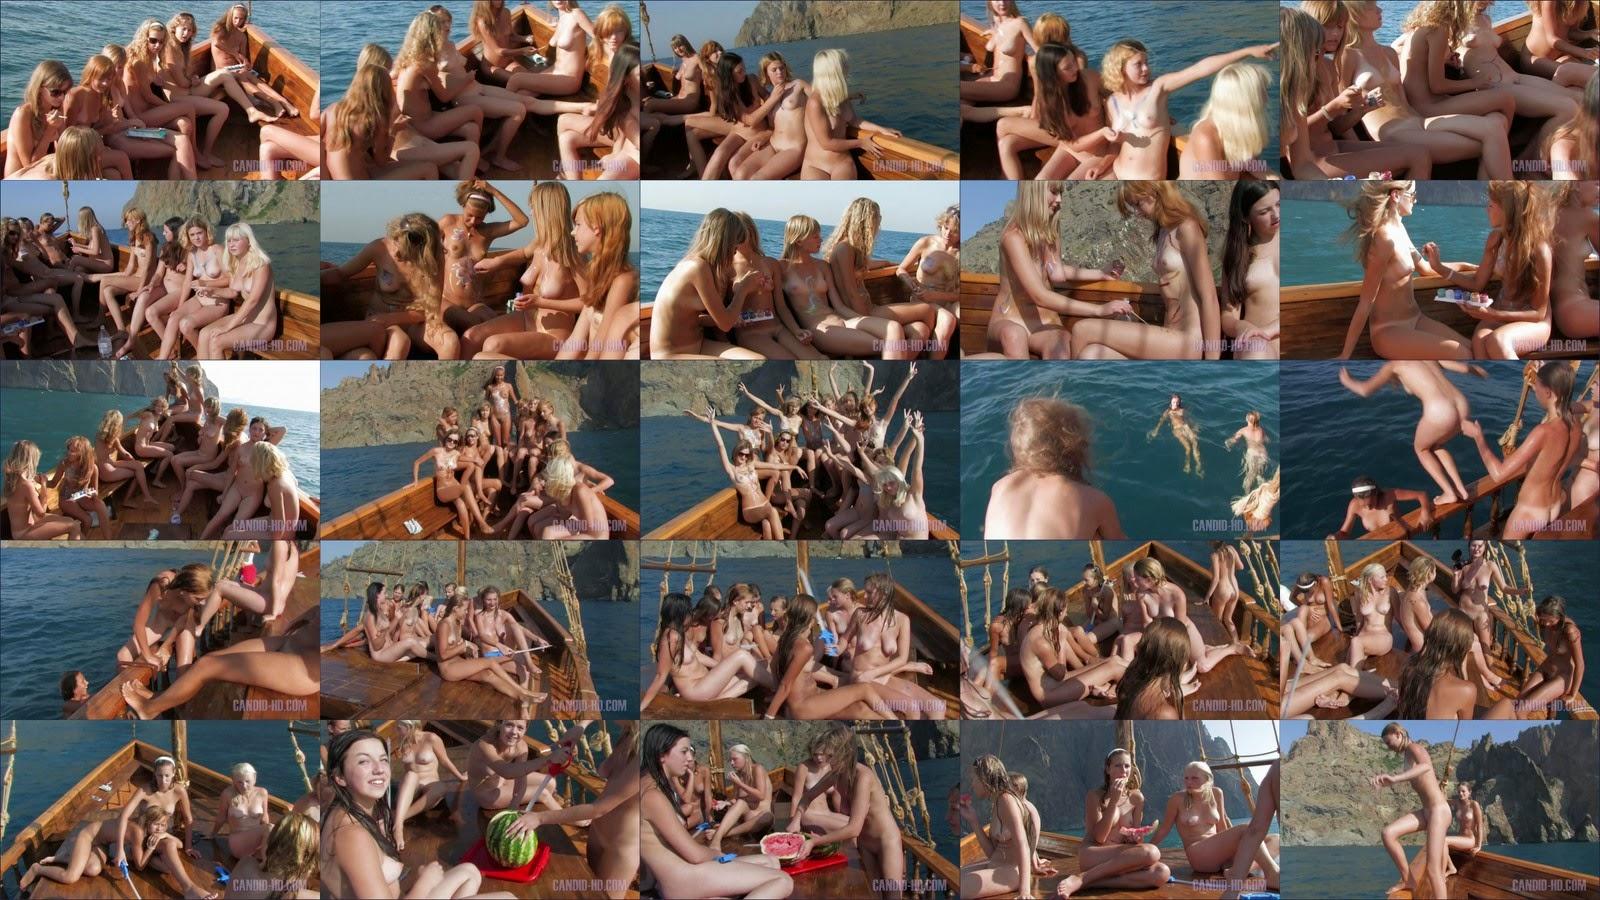 Nude hd piratebay nude images